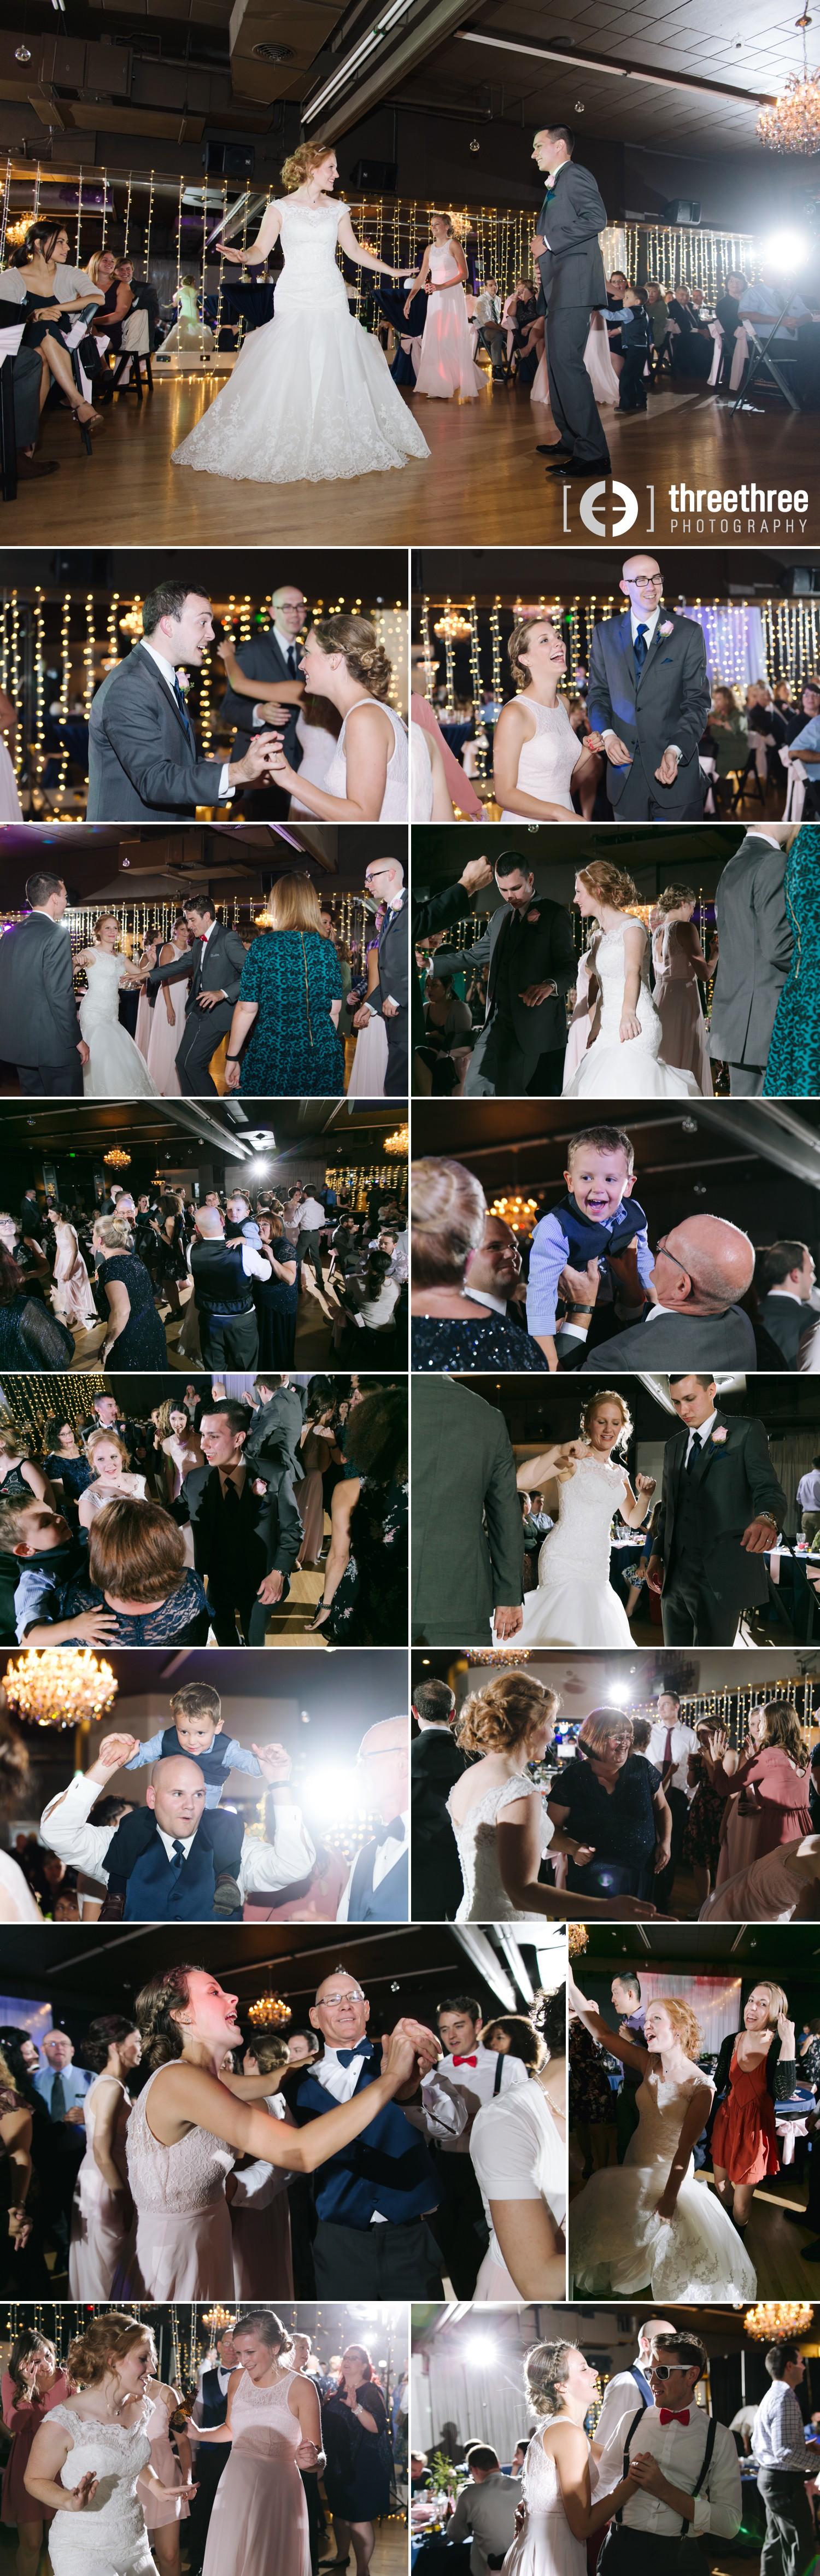 Temerity_KC Wedding Photography 9.jpg